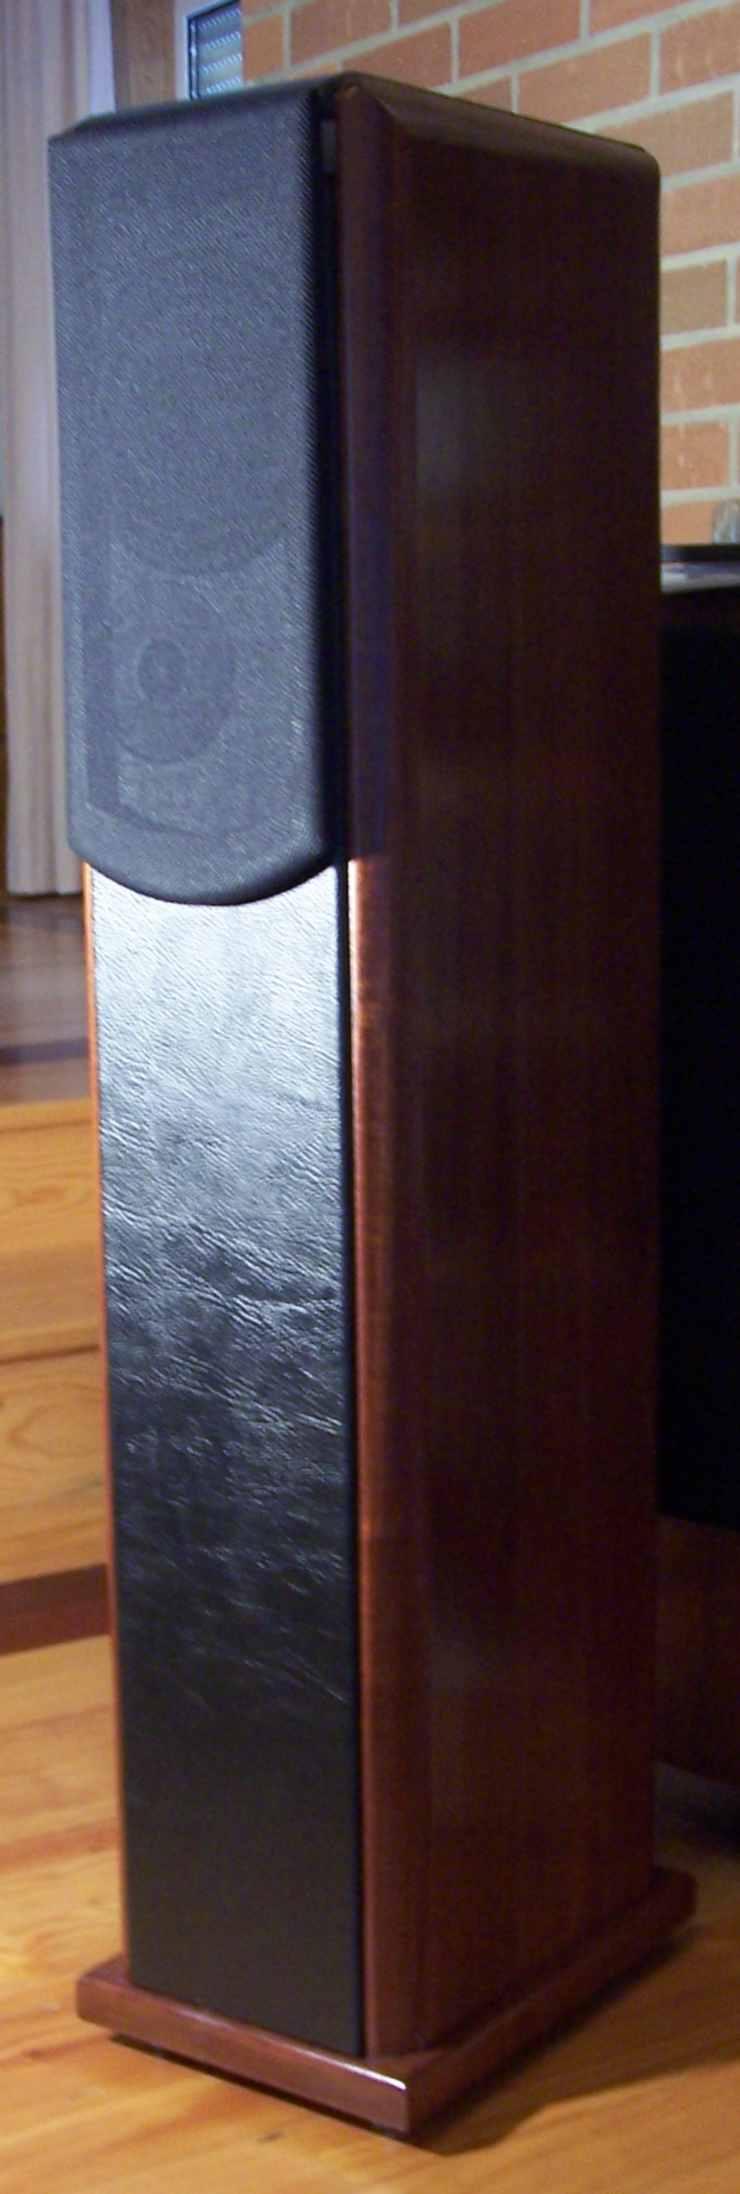 interior - Colunas de som DIY - Página 3 Primus10